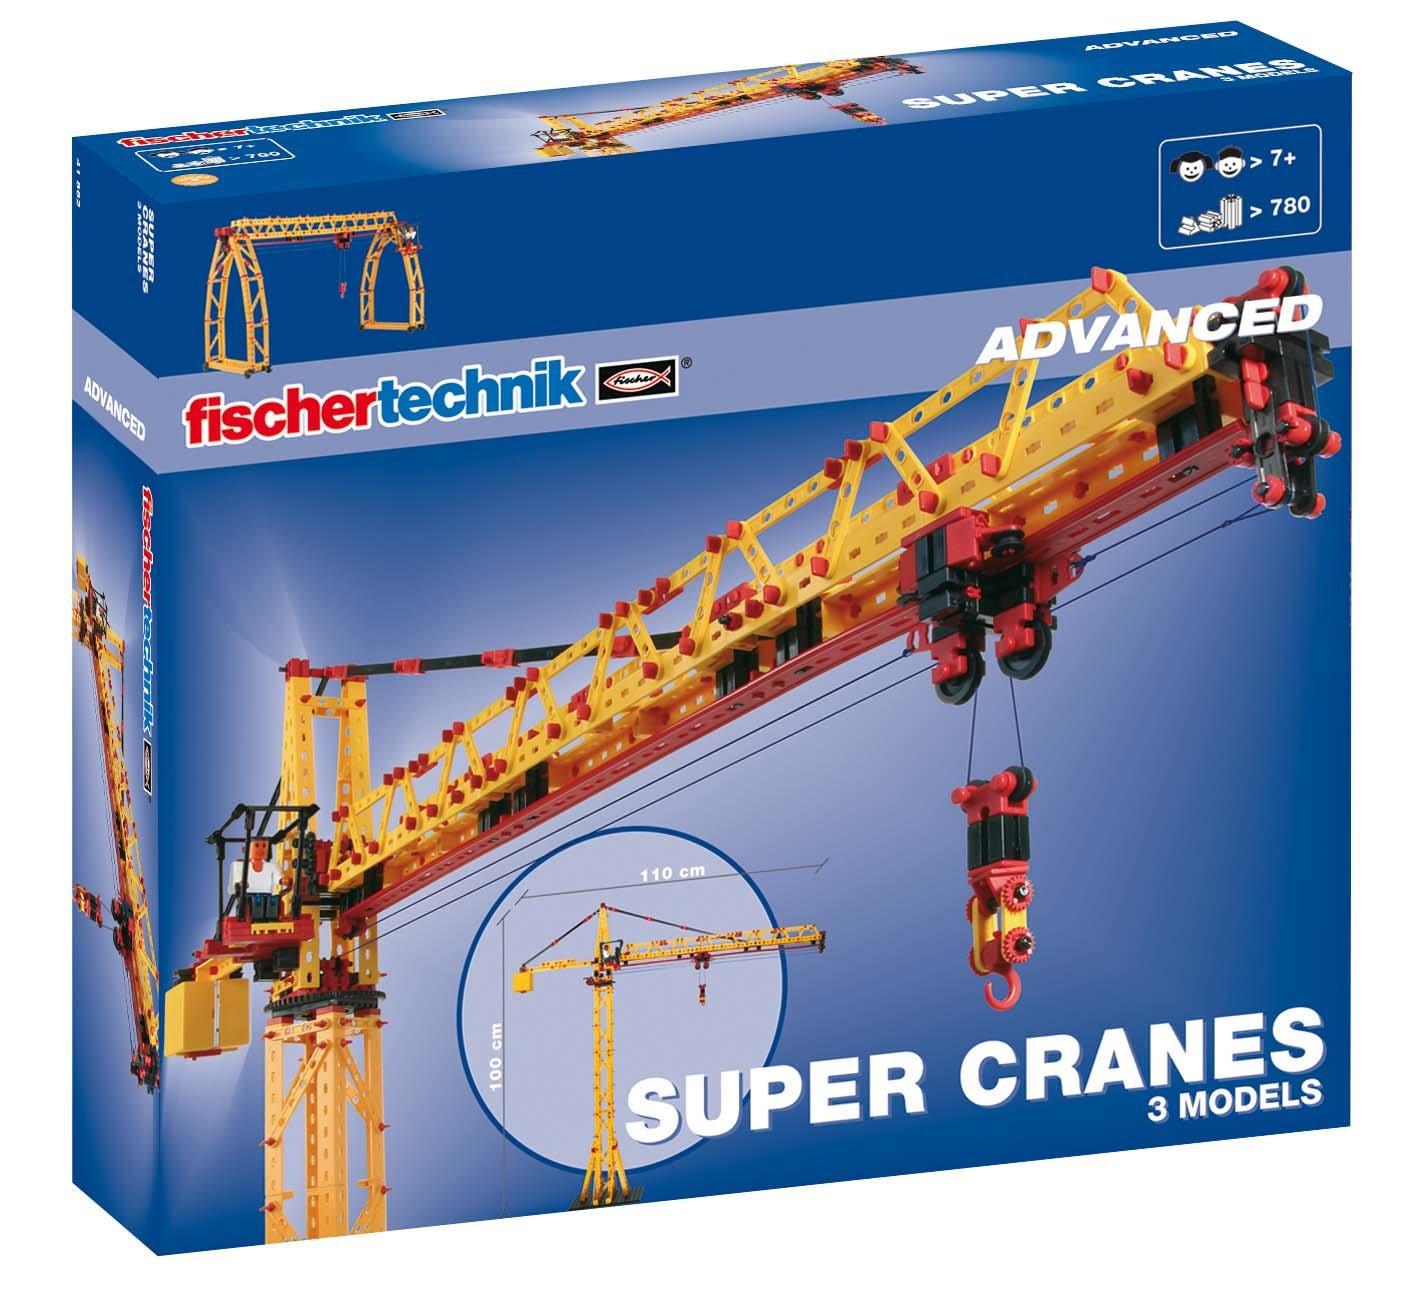 Fischertechnik 41862 - - - Super Cranes 99bb09